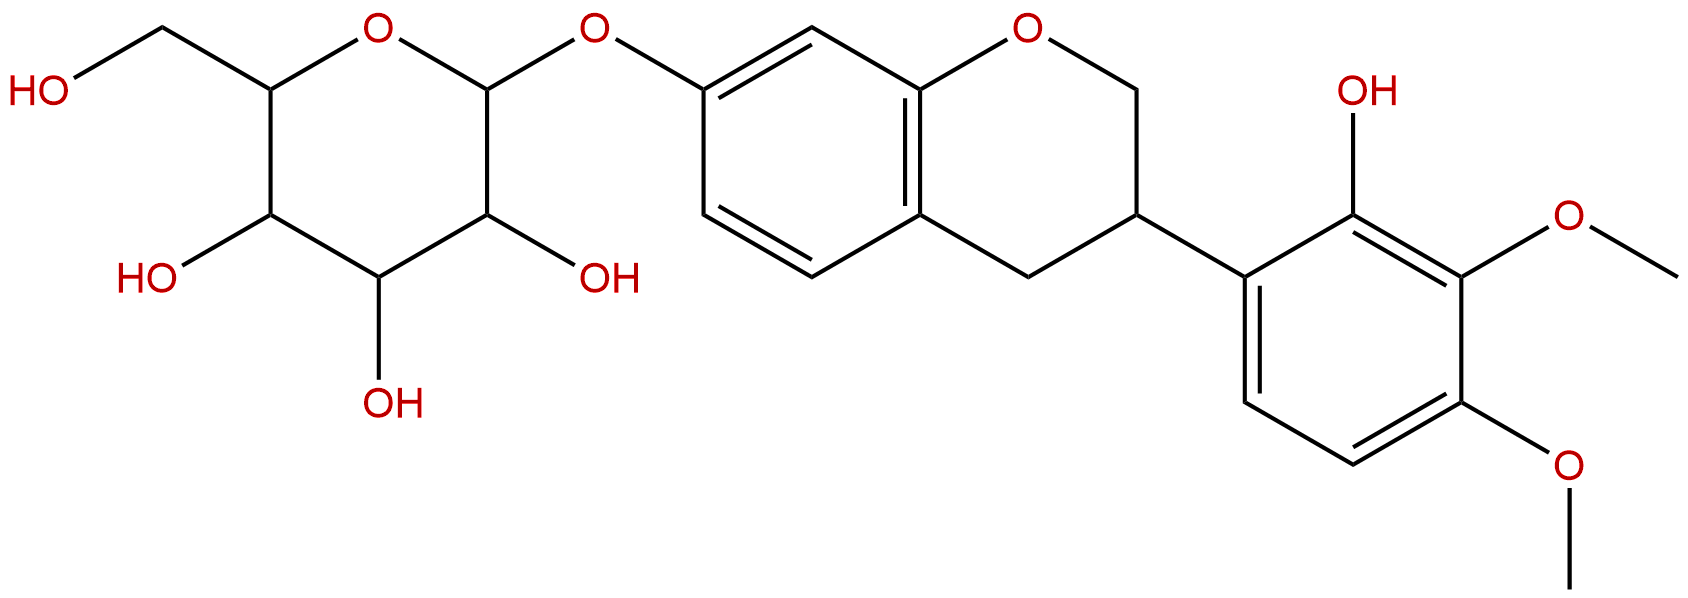 Astraisoflavan-7-O-β-D-glucoside